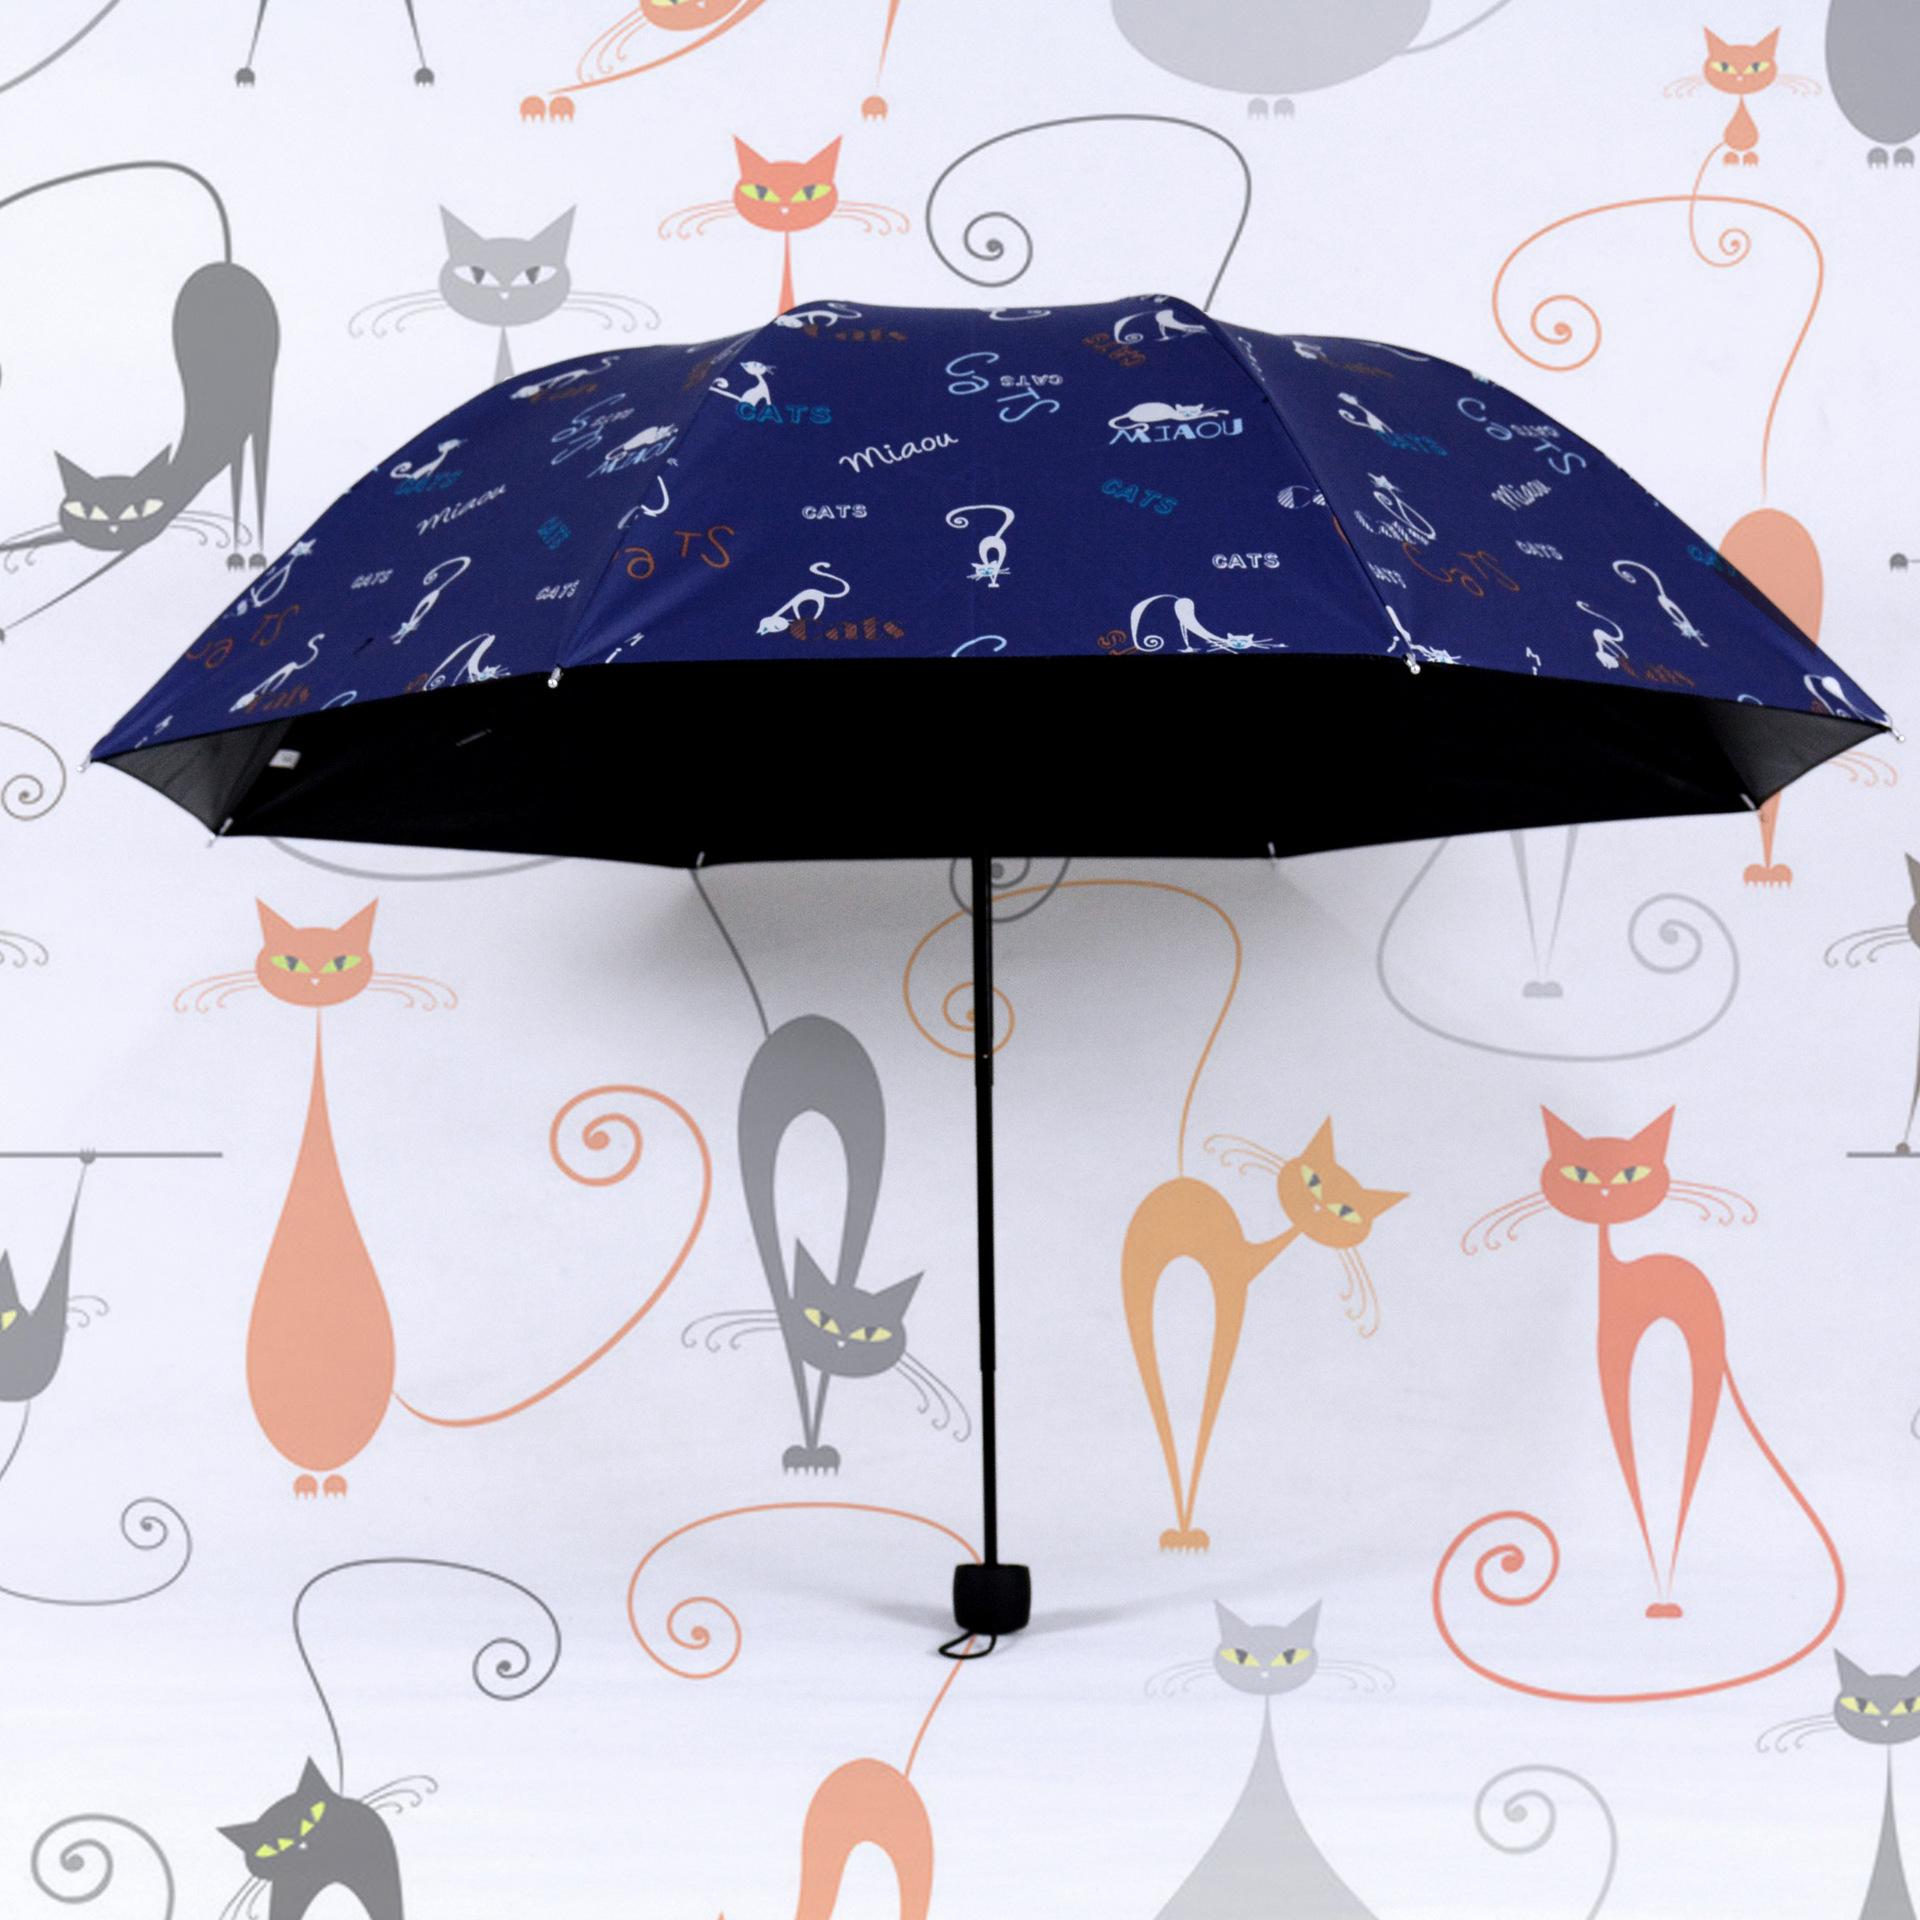 new Flat edge kitten mirror printing large umbrella vinyl UV sun umbrella rain shine creative ultralight vinyl pencil umbrella(China (Mainland))